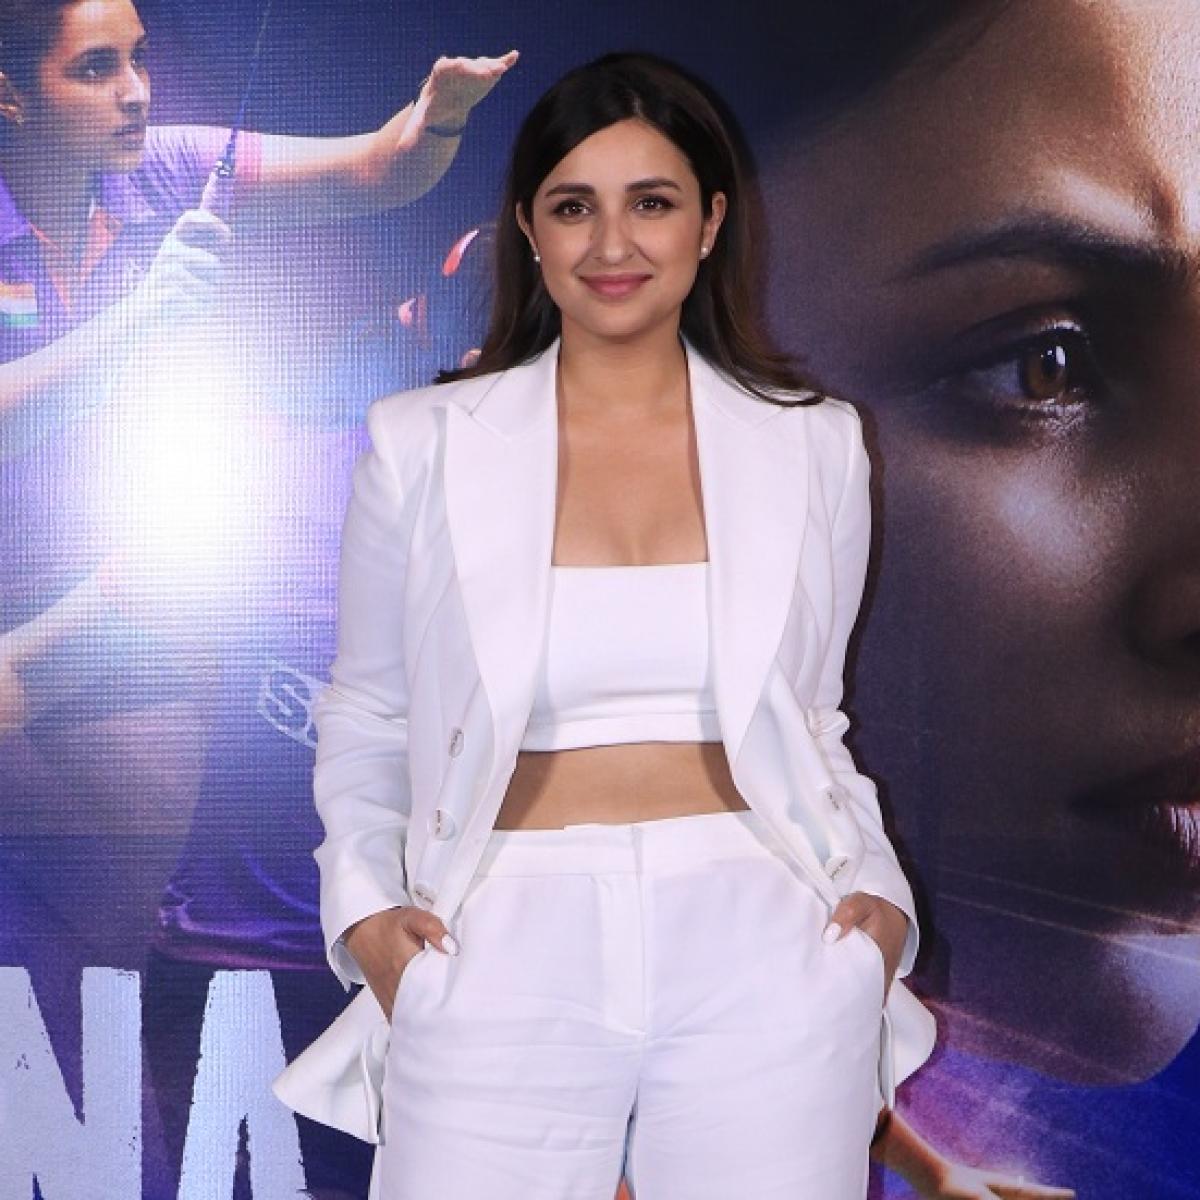 I didn't take any external pressure: Parineeti Chopra on playing badminton player Saina Nehwal in 'Saina' biopic